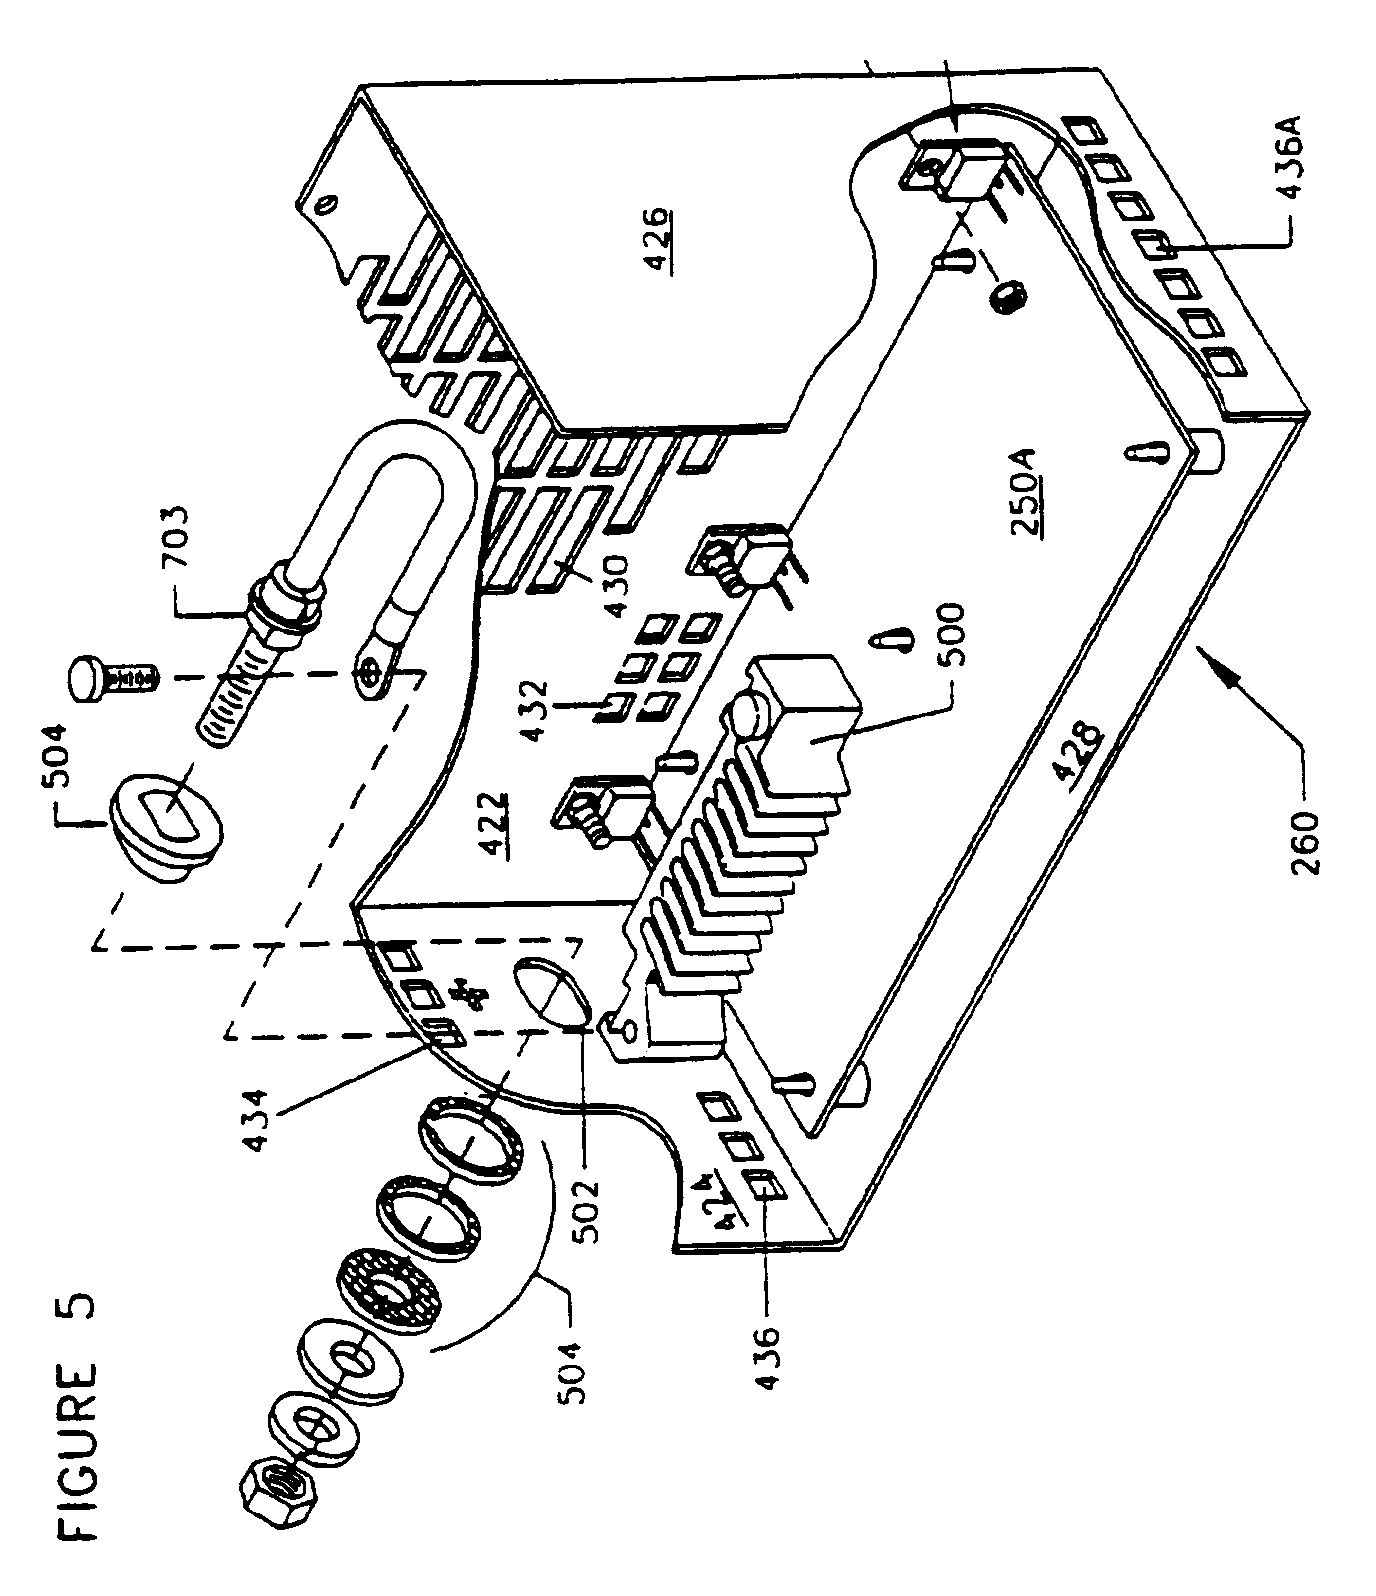 Powermate Pm053520203 Parts List And Diagram Ereplacementpartscom